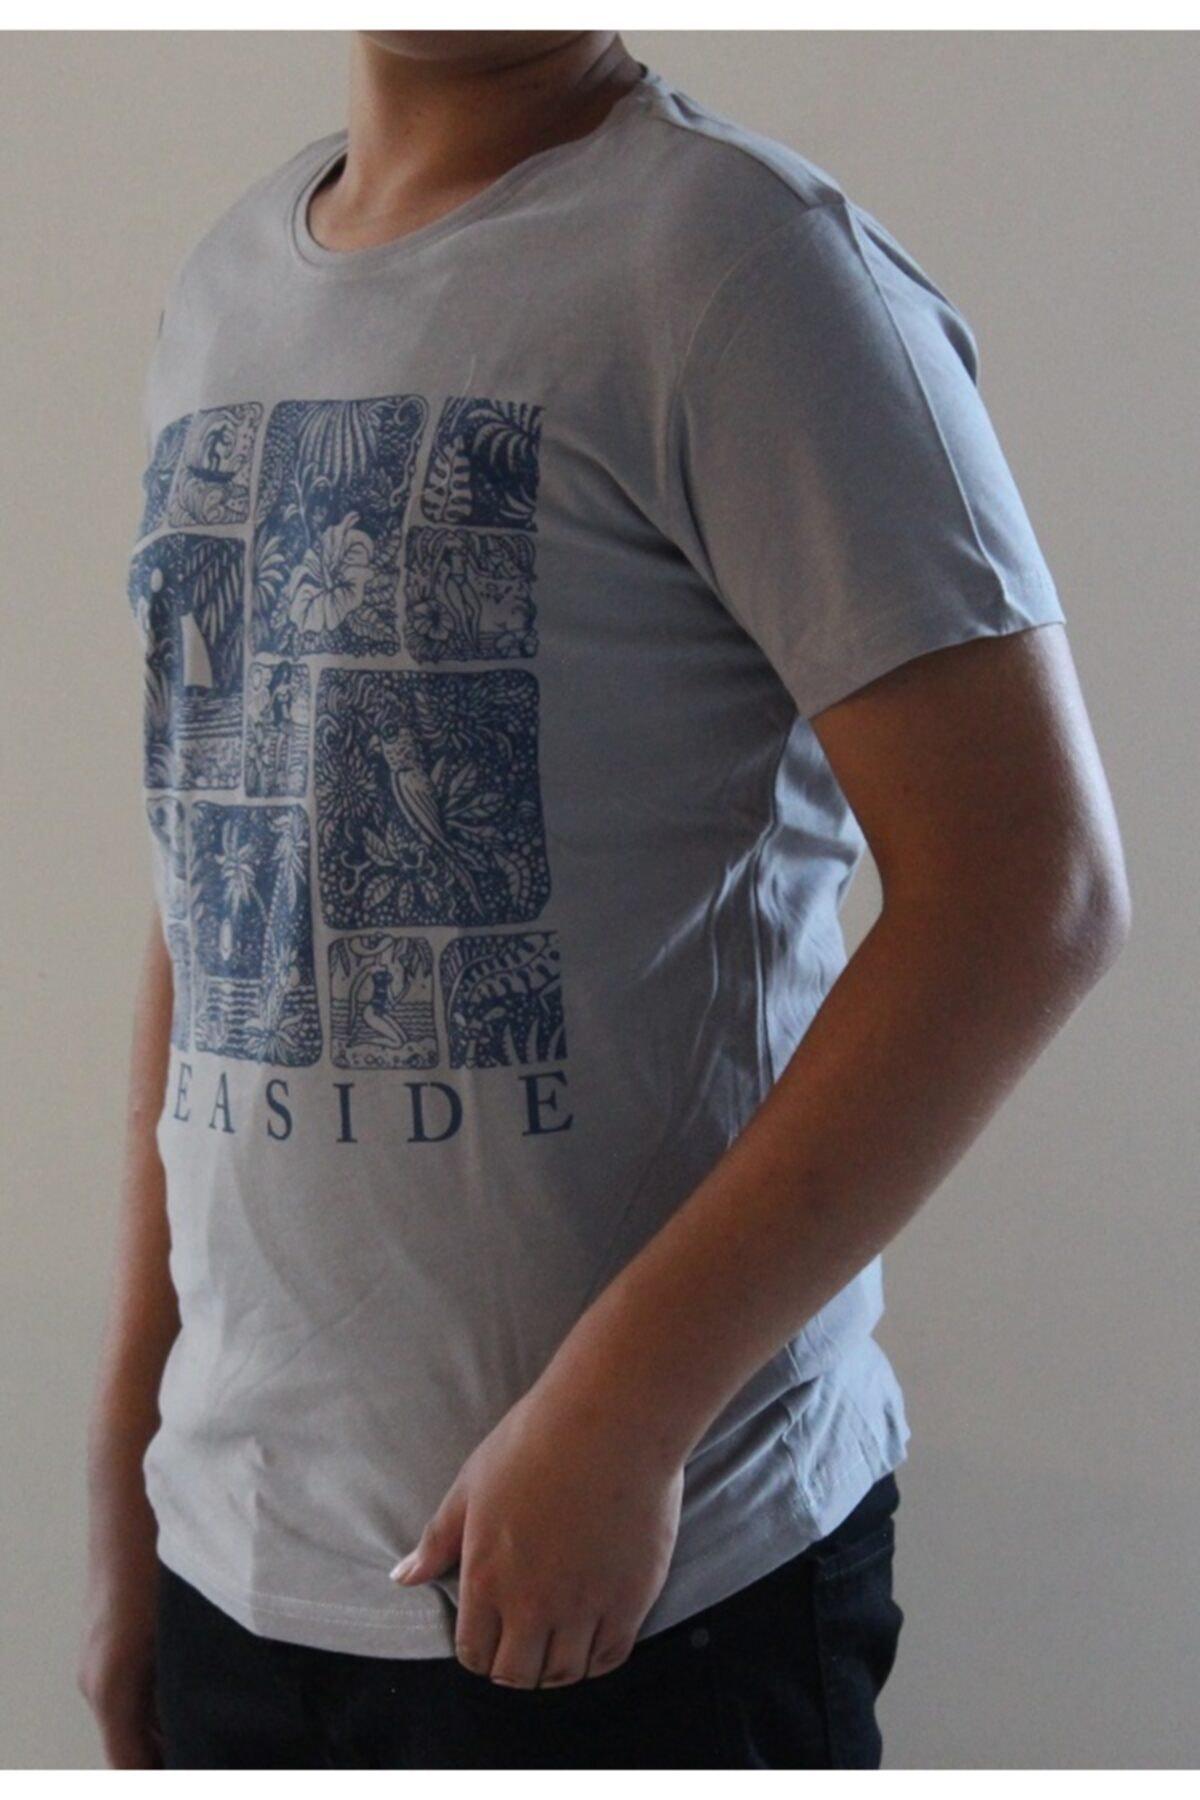 Lion Erkek Gri Bisiklet Yaka T-shirt 2711 1